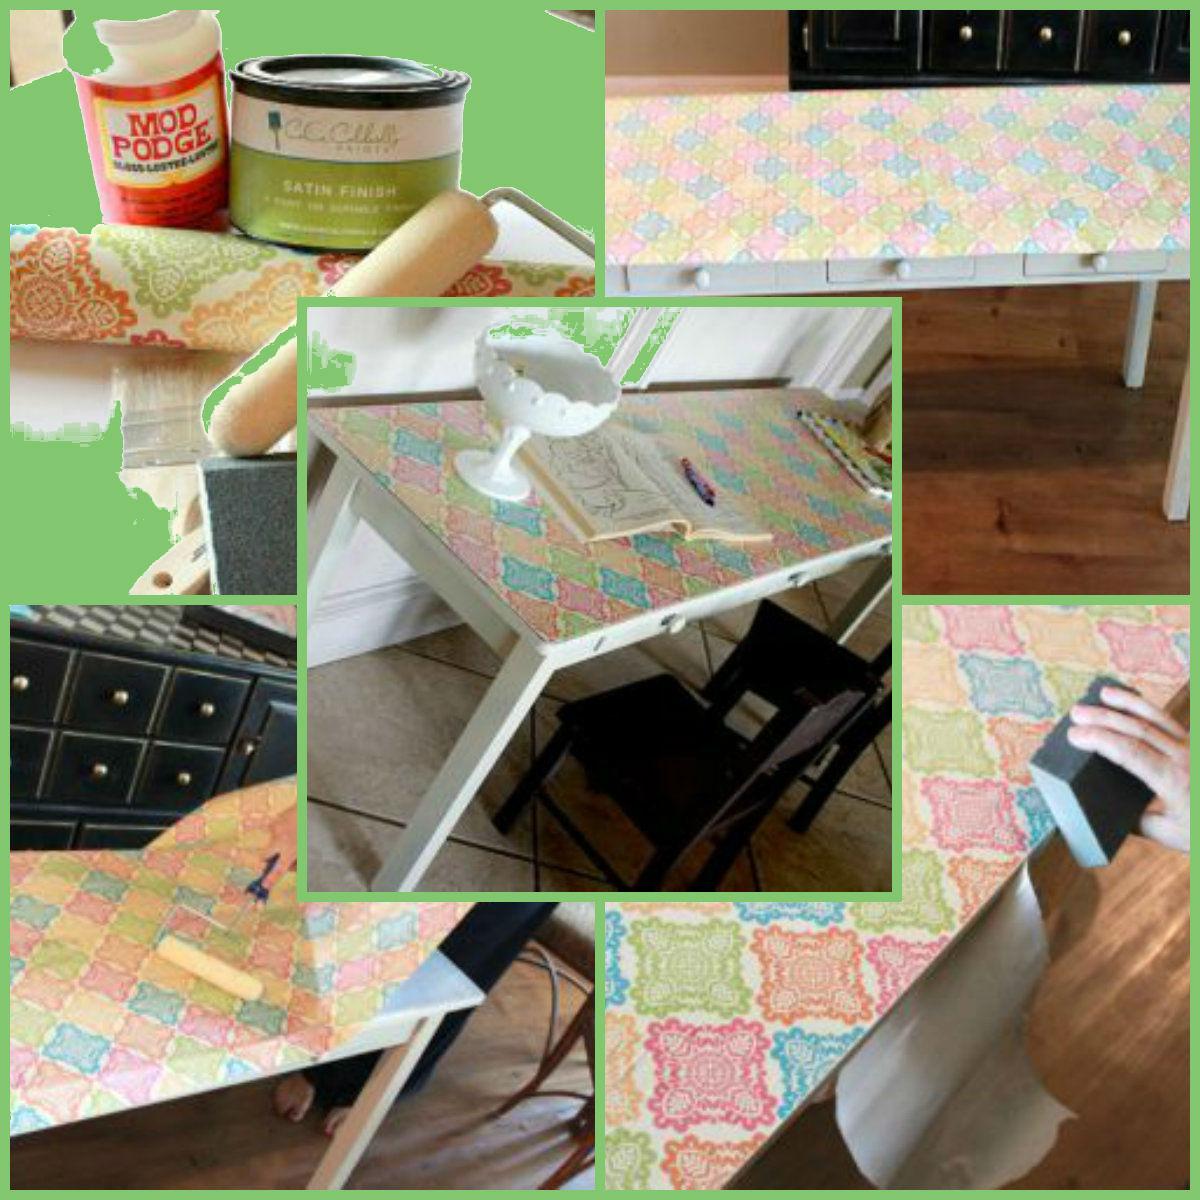 обеденного стола